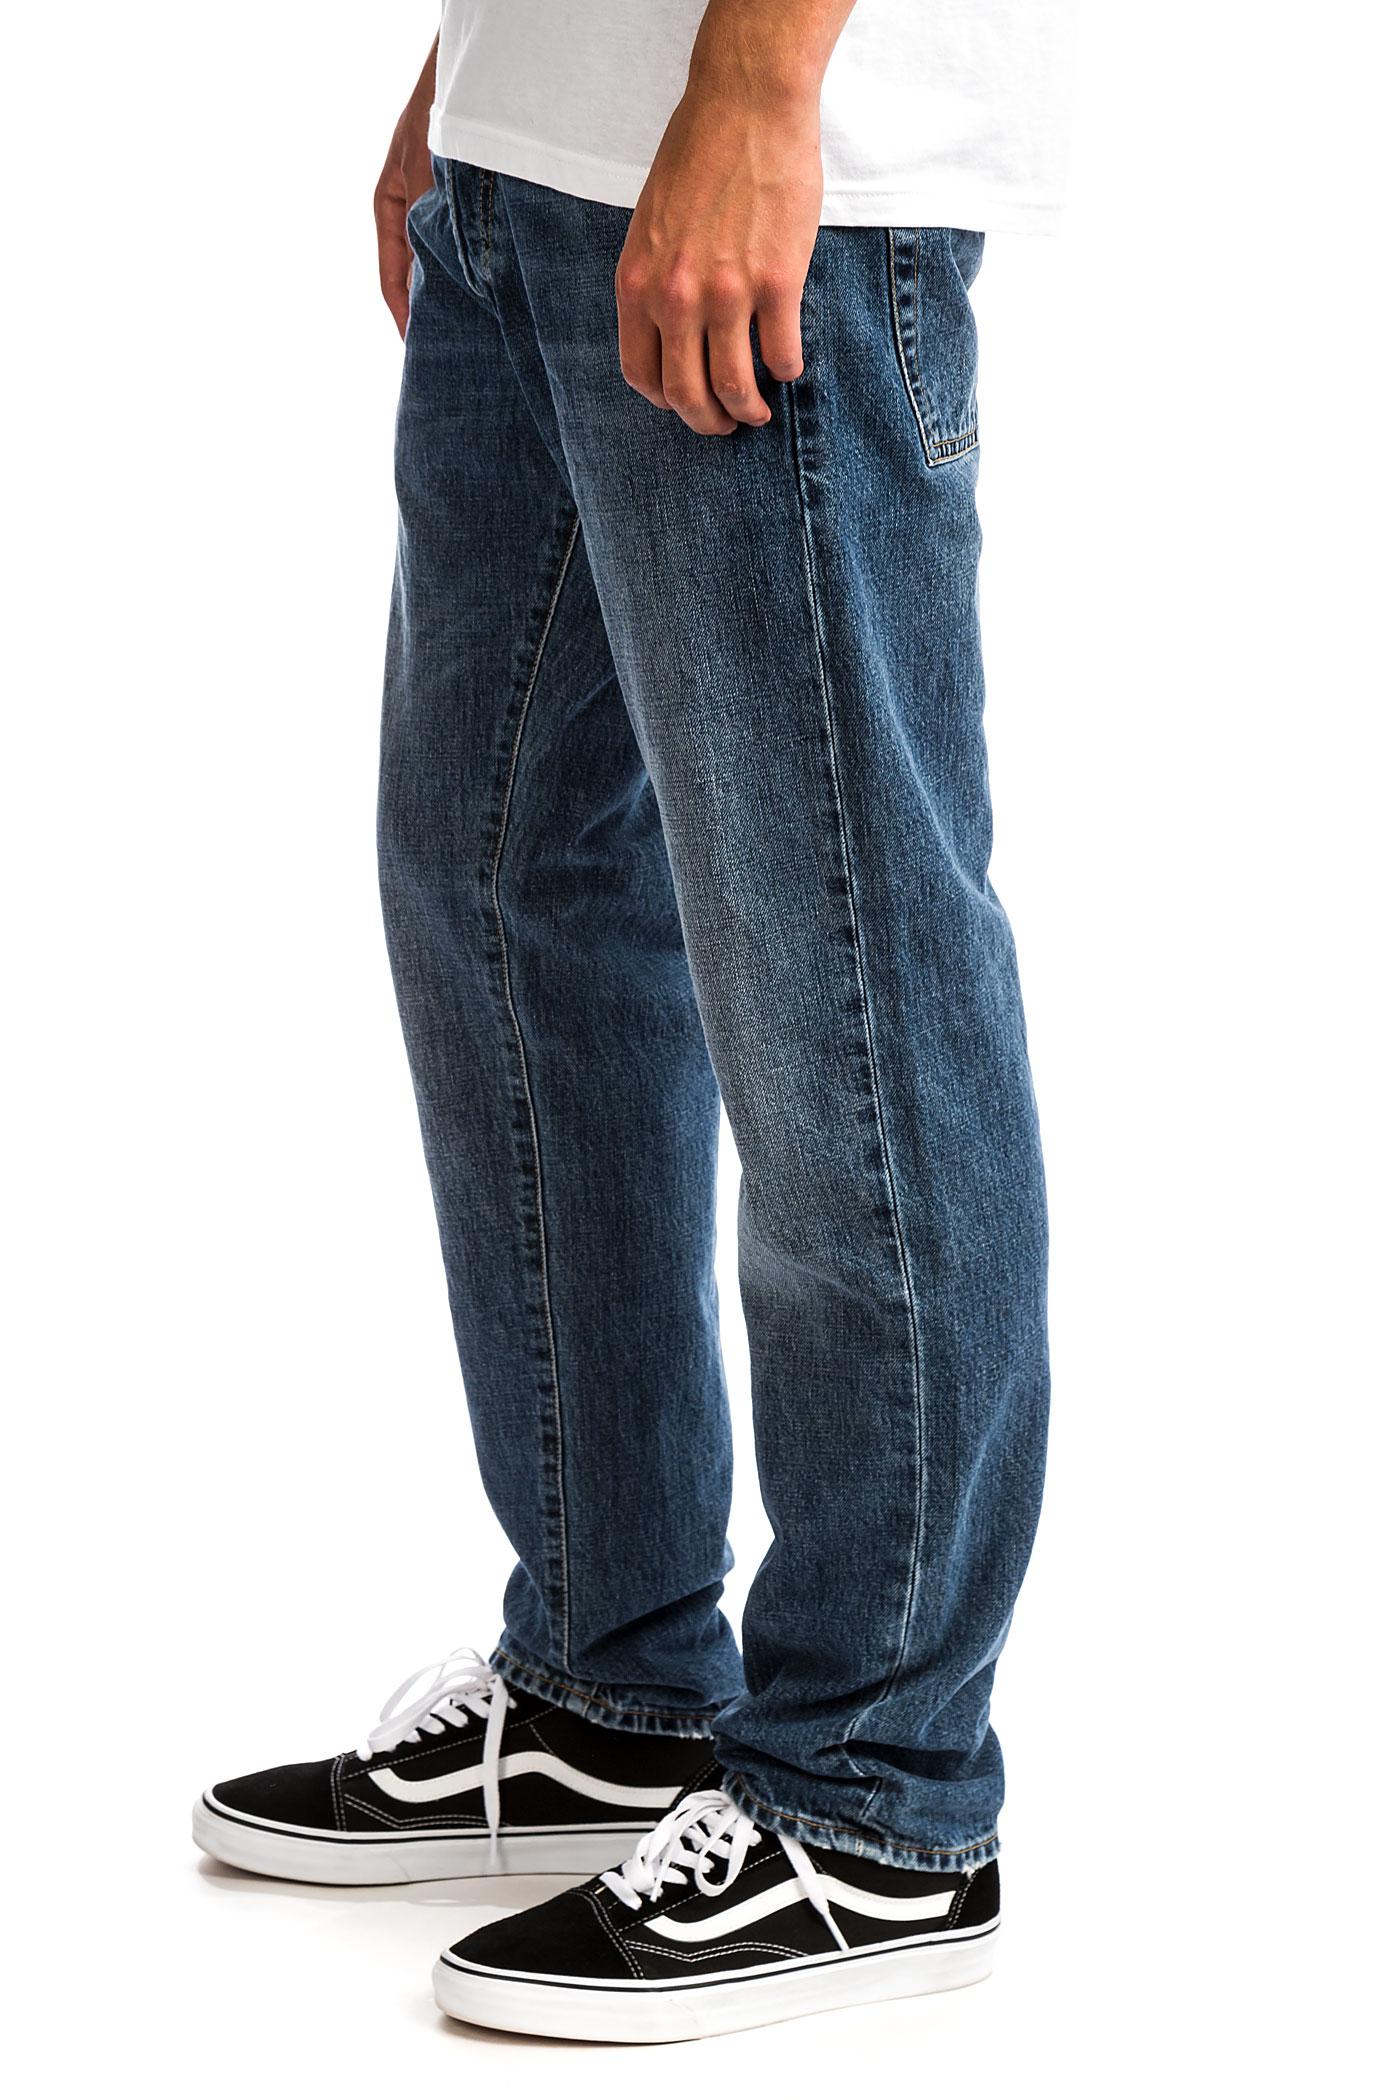 Edgewood Carhartt Jeansblue Klondike Wip Coast Pant Stone CBordxeW